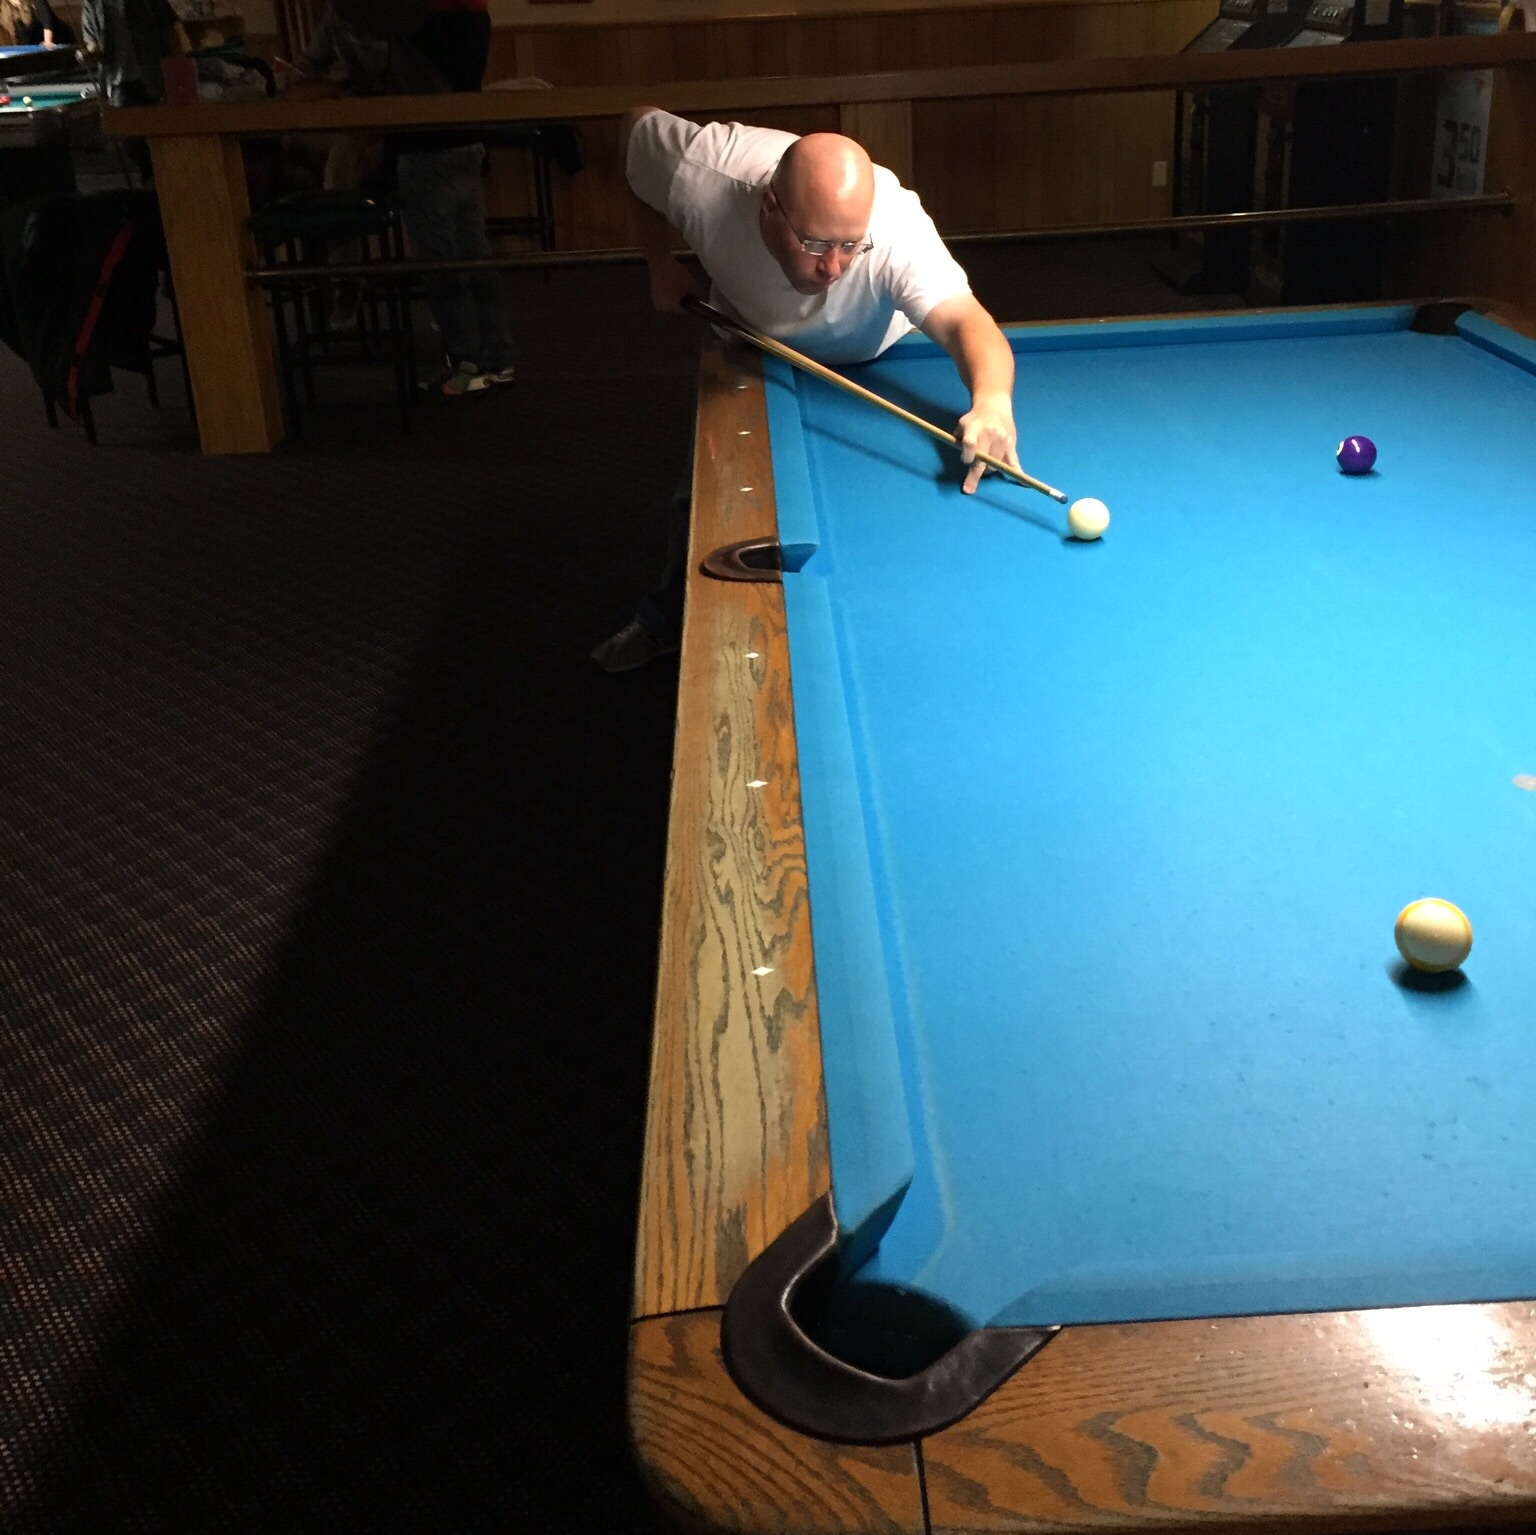 NomadPoolcom Choice Pool Tournament Ball Or Ball - Tournament choice pool table